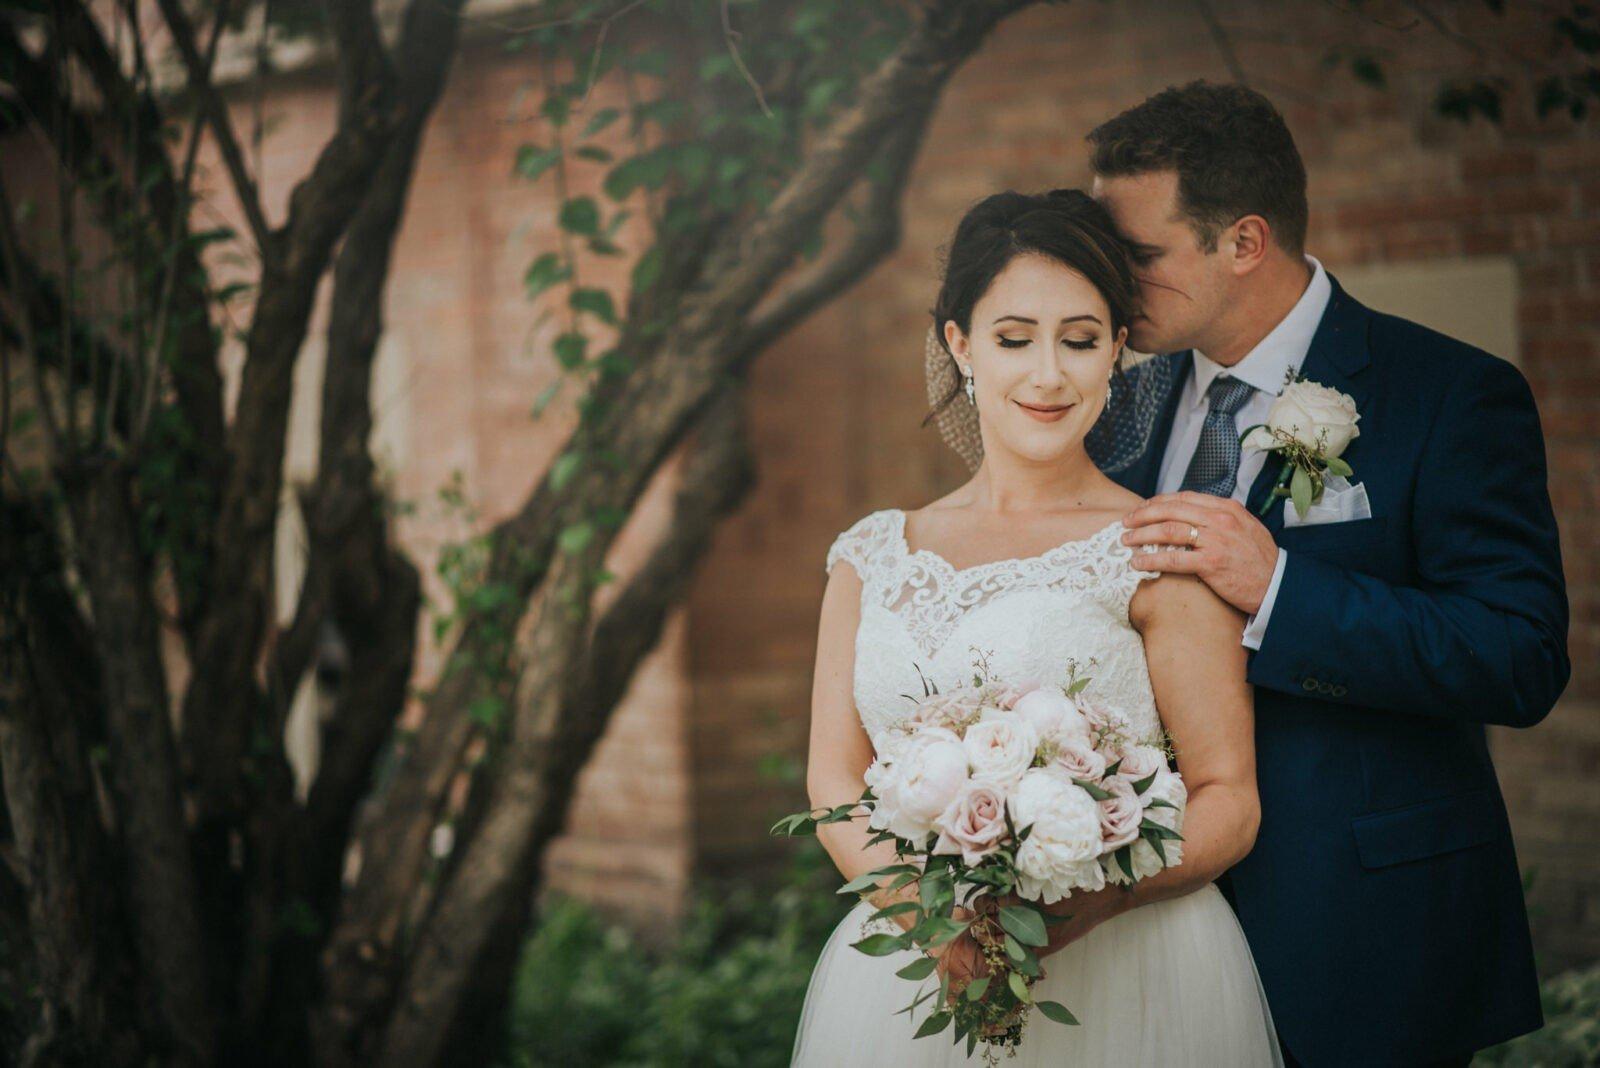 edmonton wedding photography brunch